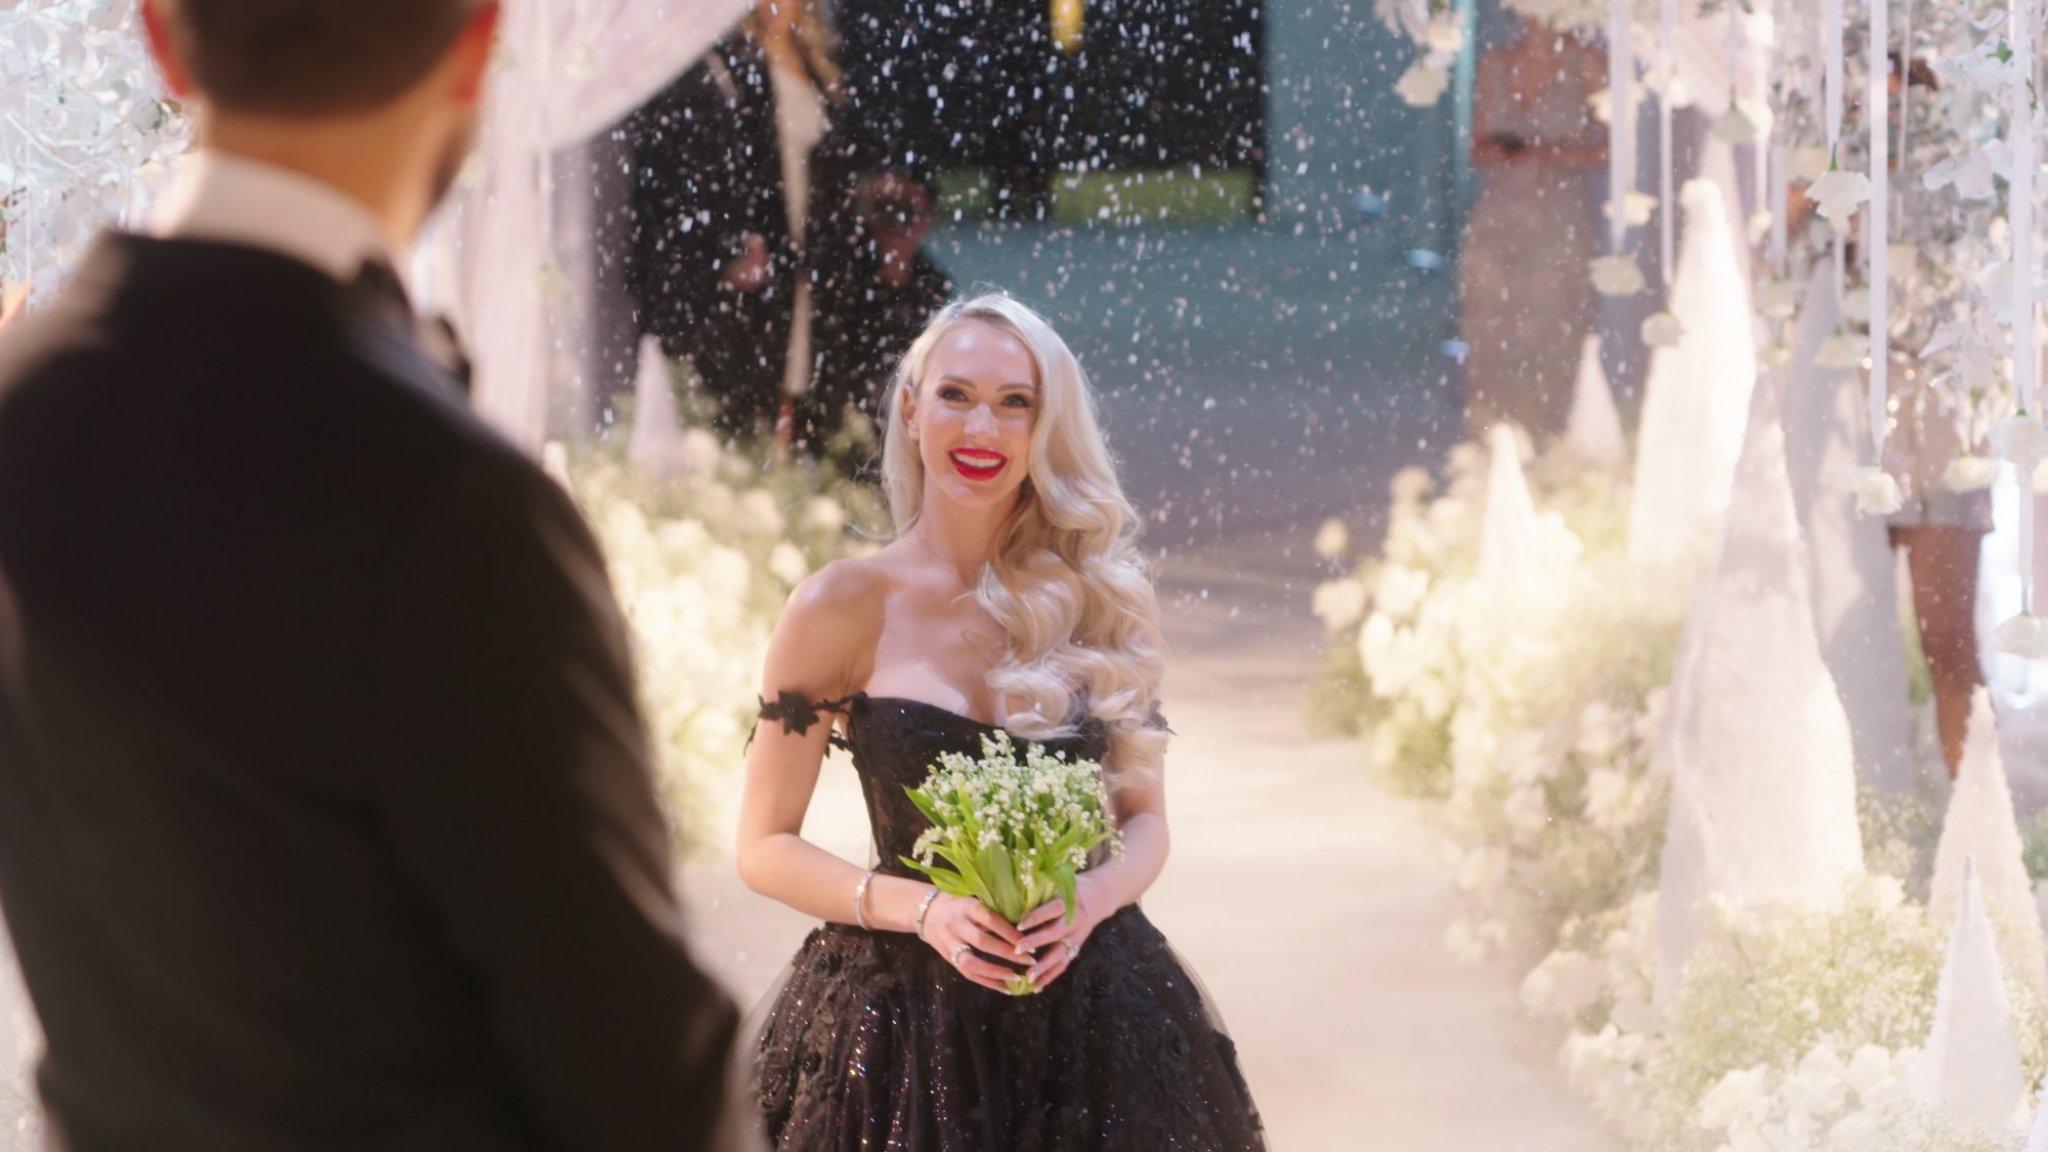 Christine wil bevalling filmen voor Selling Sunset: 'Sta ervoor open' - RTL Boulevard